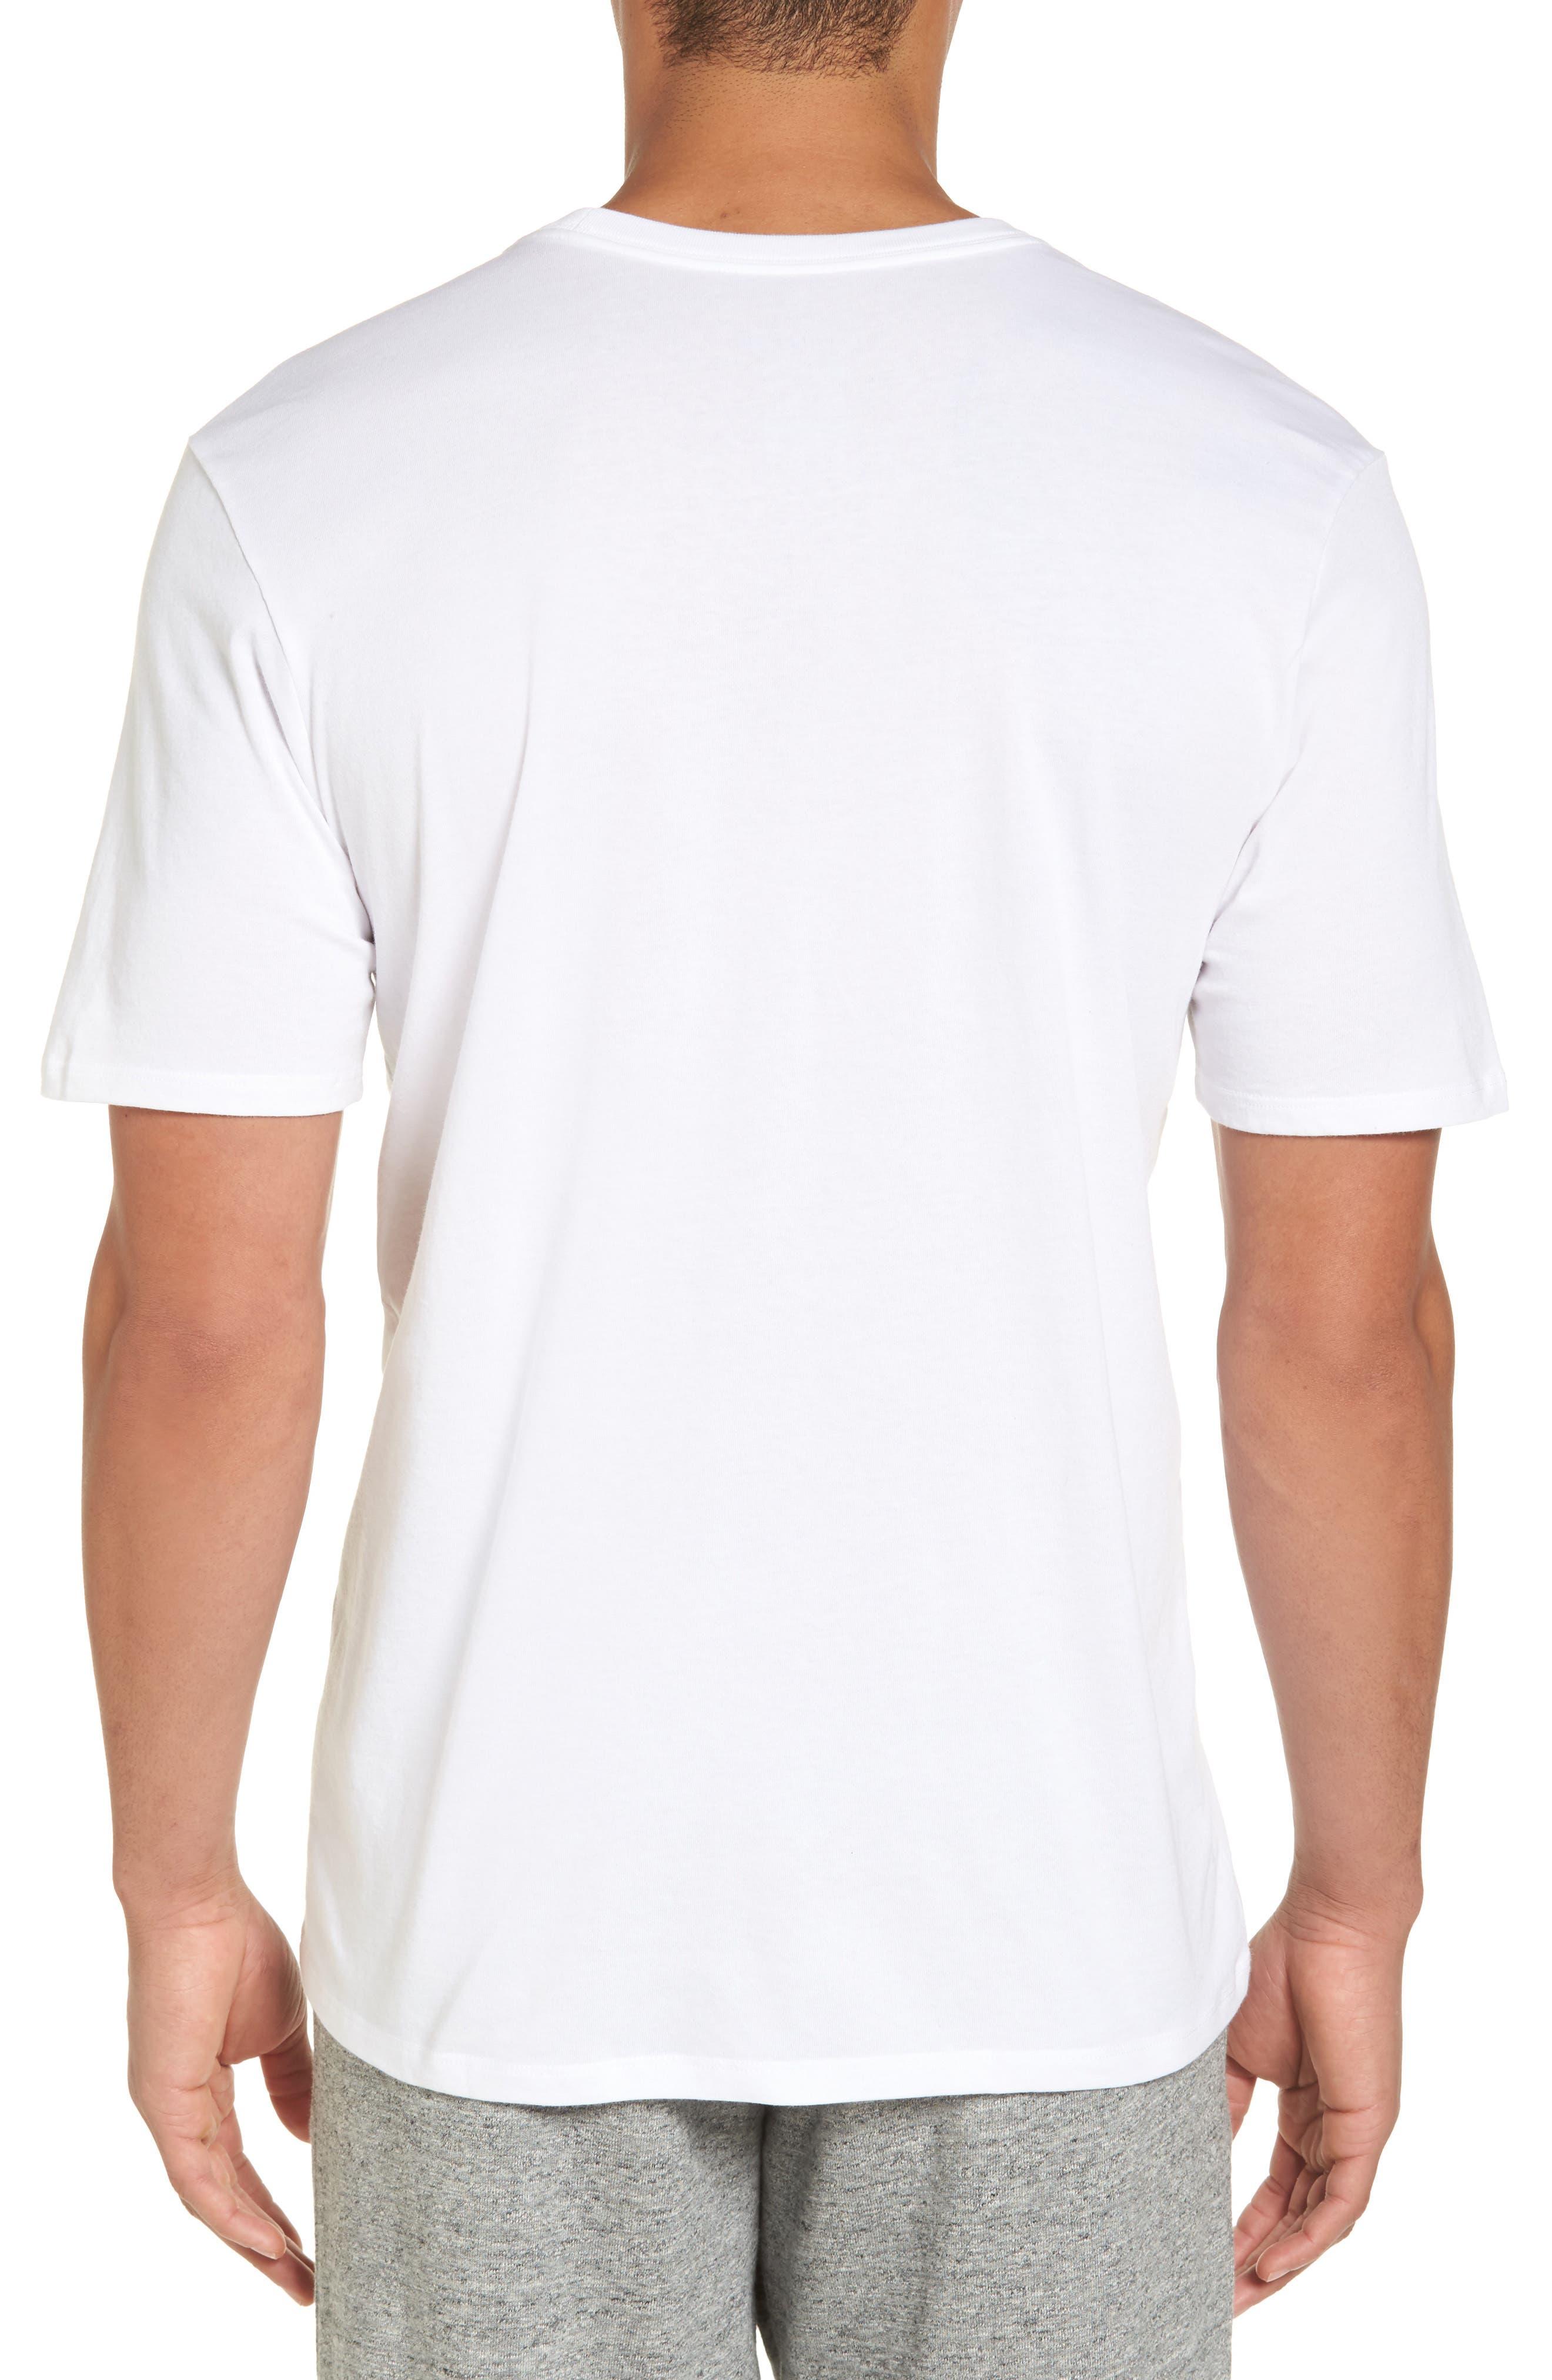 Dry No Excuses Training T-Shirt,                             Alternate thumbnail 2, color,                             White